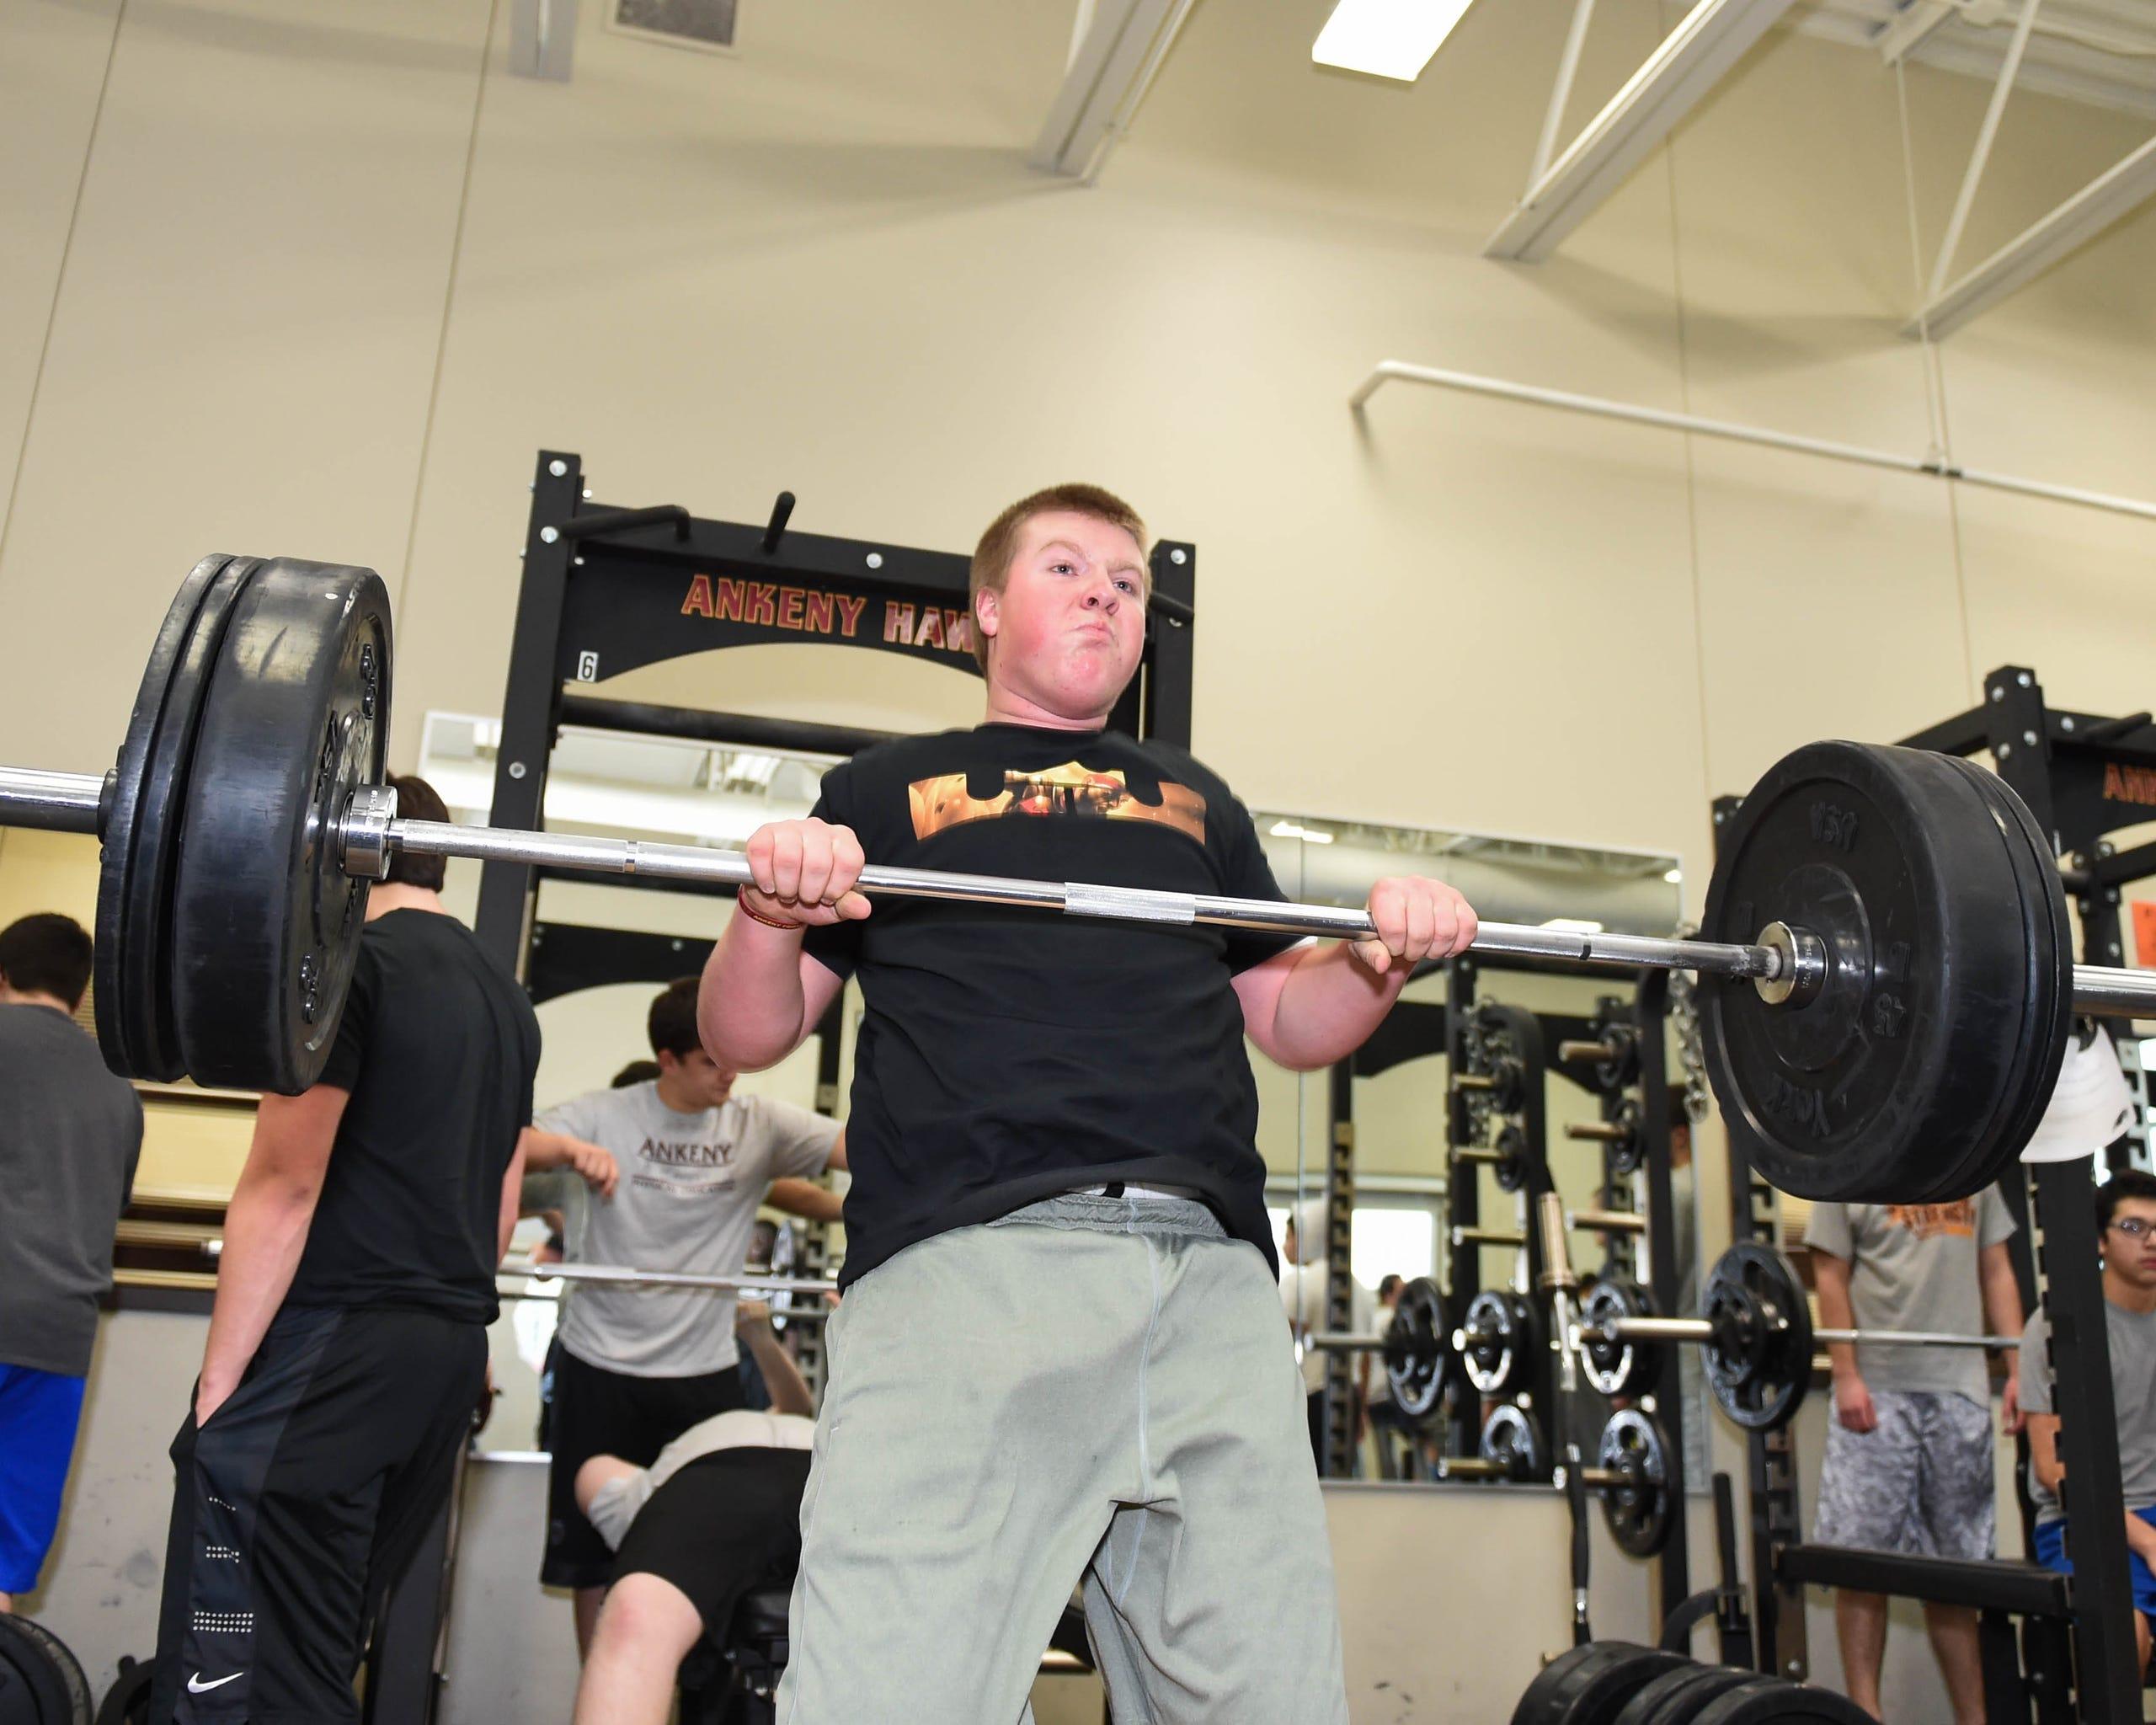 25 photos: Ankeny High strength training